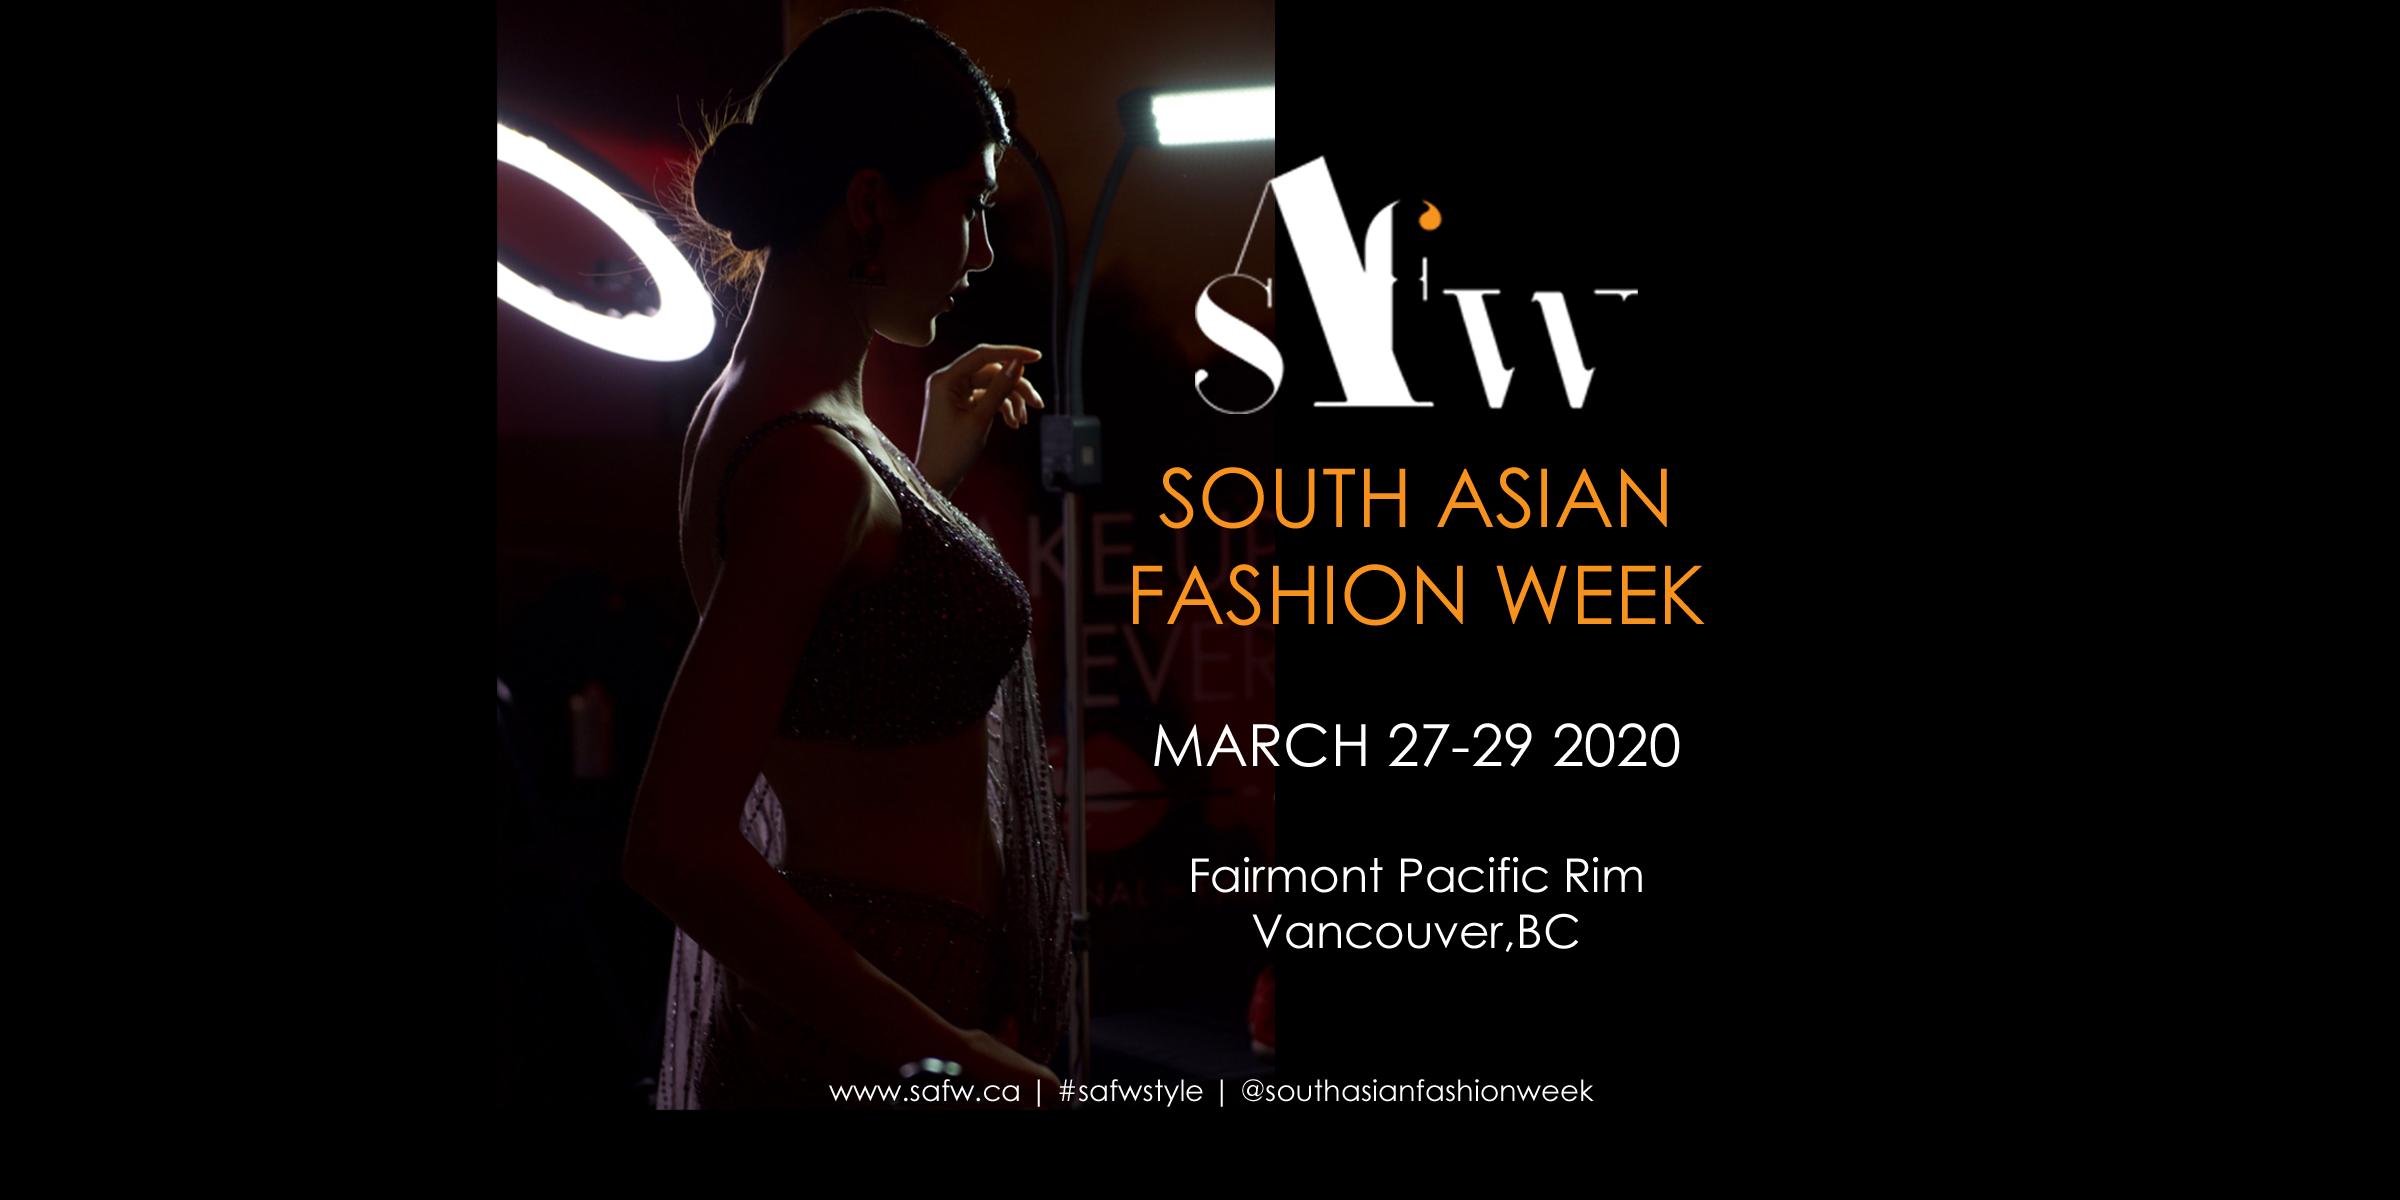 South Asian Fashion Week